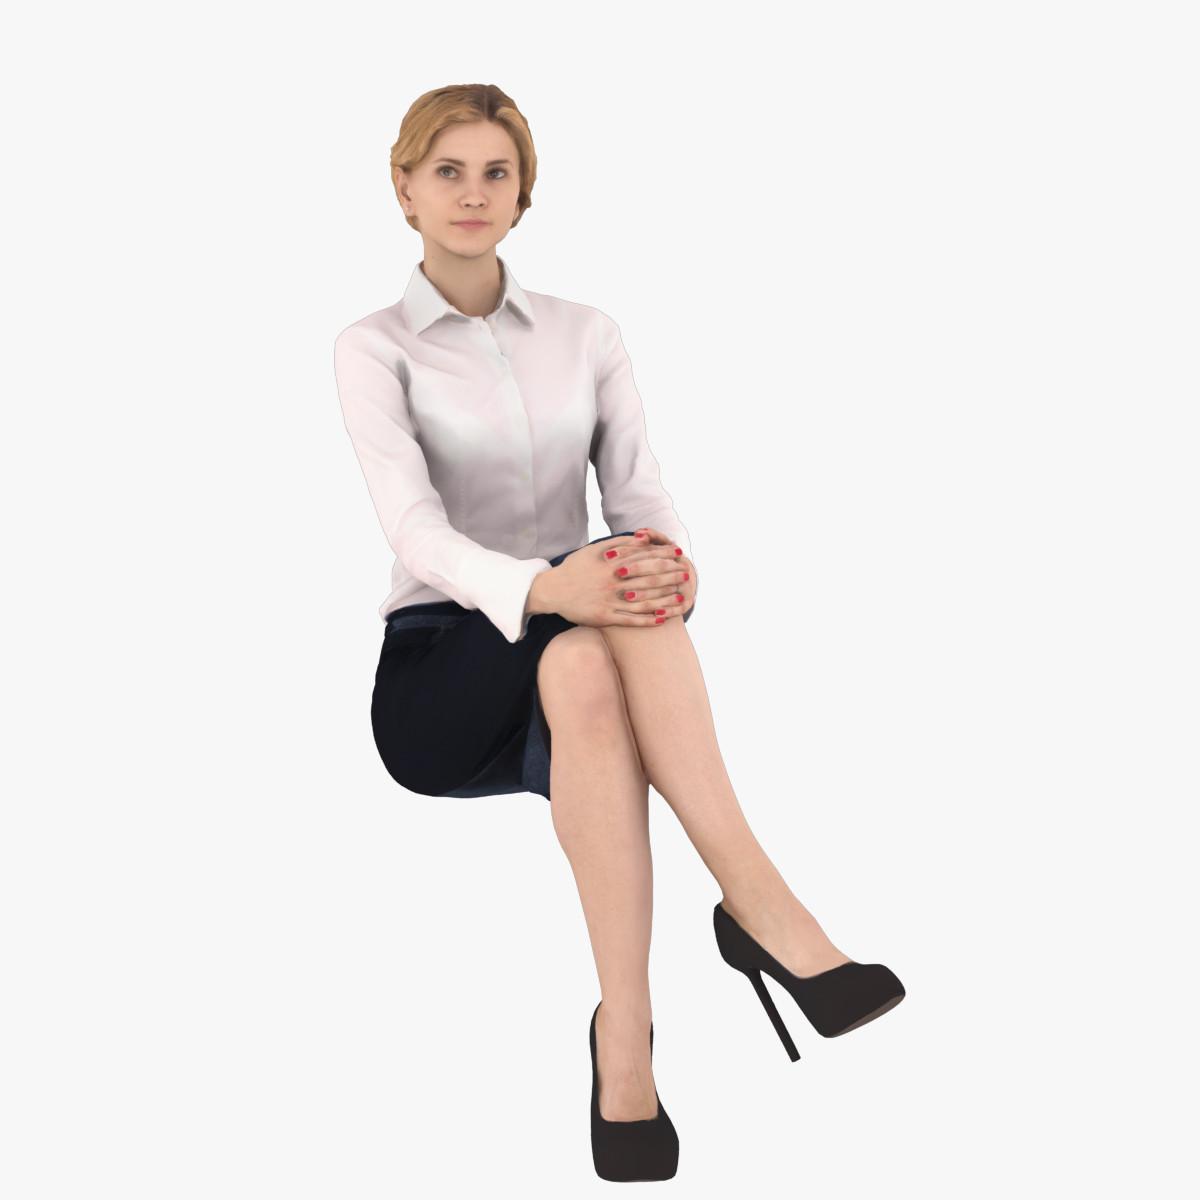 woman business 3d